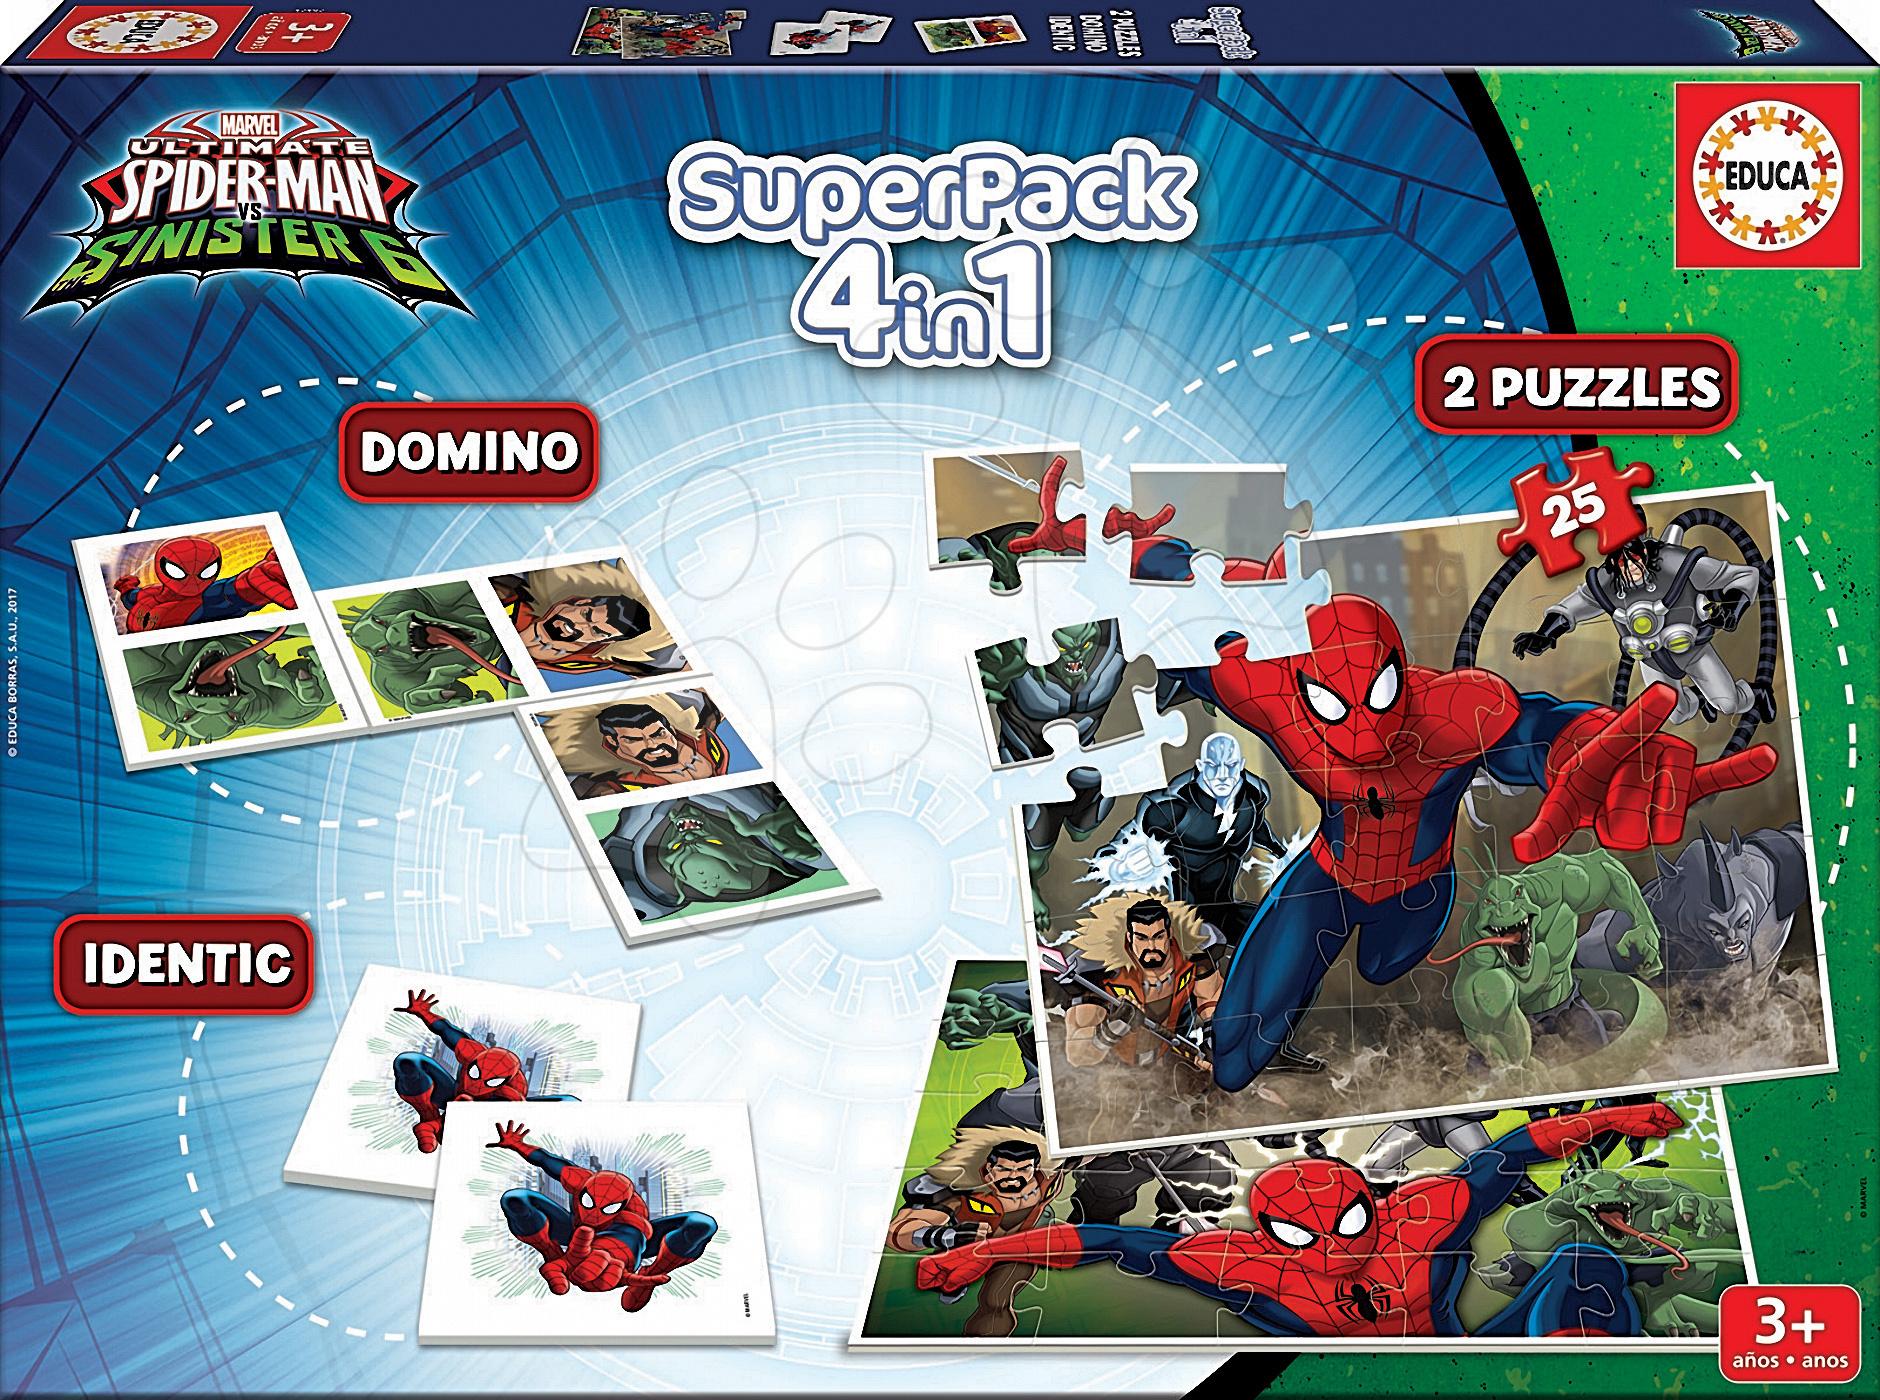 Puzzle Spiderman SuperPack 4v1 Educa 2x puzzle, 1x domino a pexeso